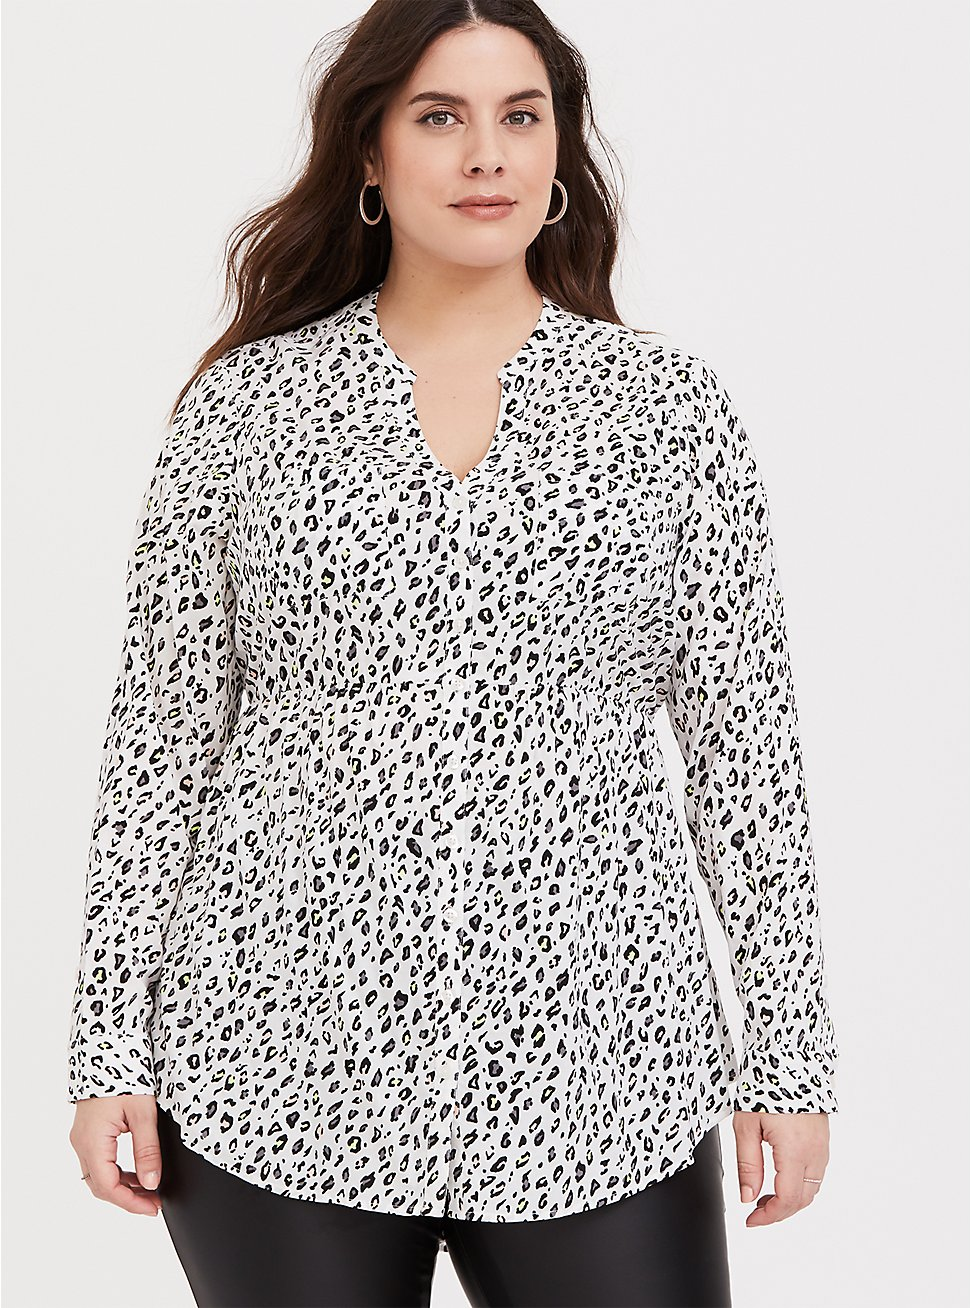 Plus Size Emma - White Leopard Print Challis Babydoll Tunic, MULTI, hi-res